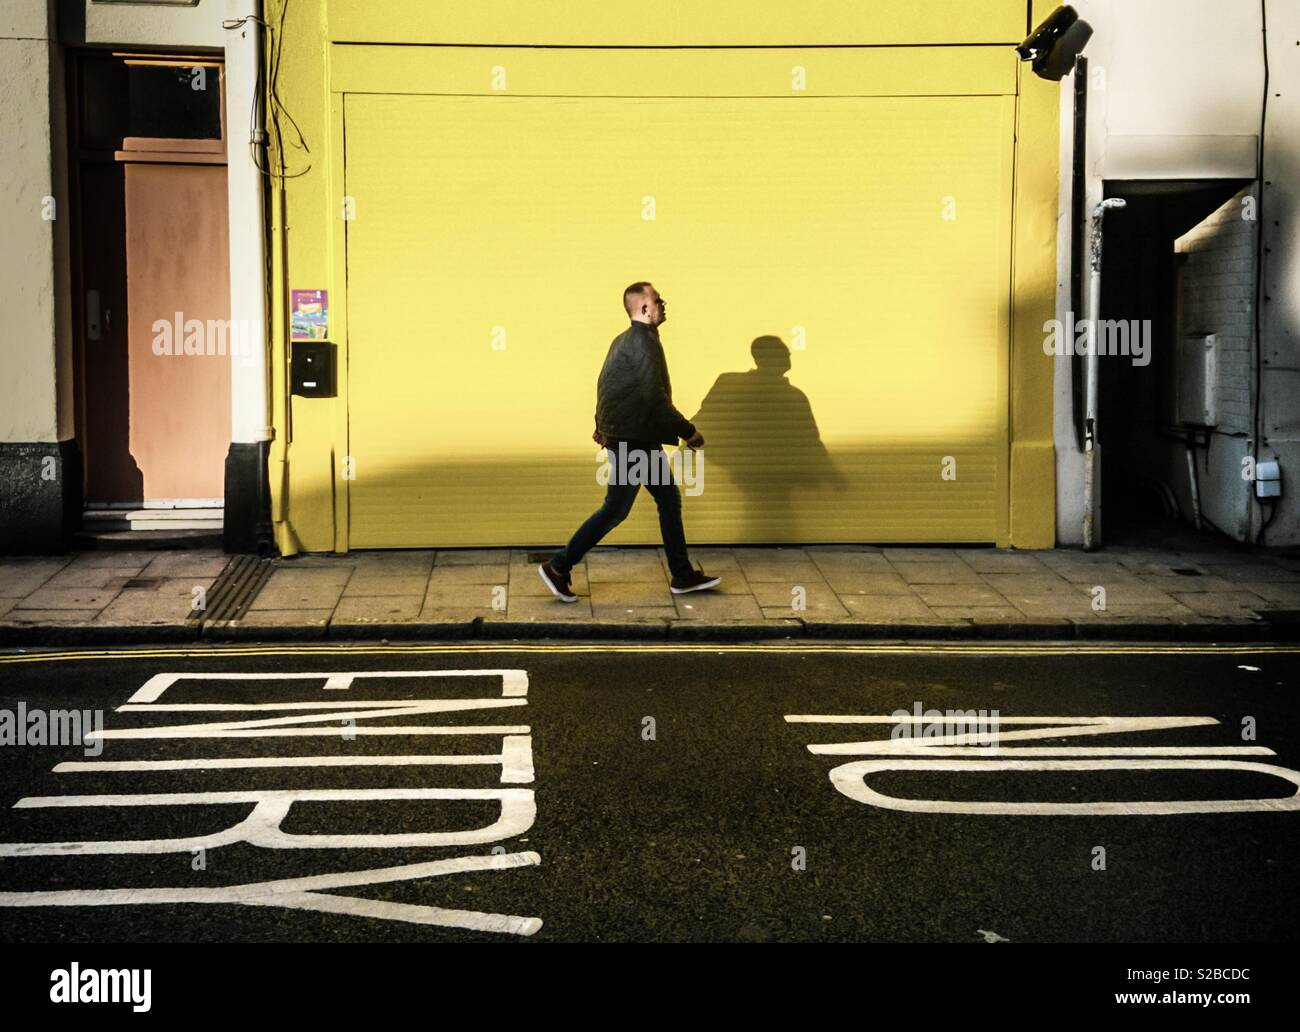 Obturador amarillo Imagen De Stock